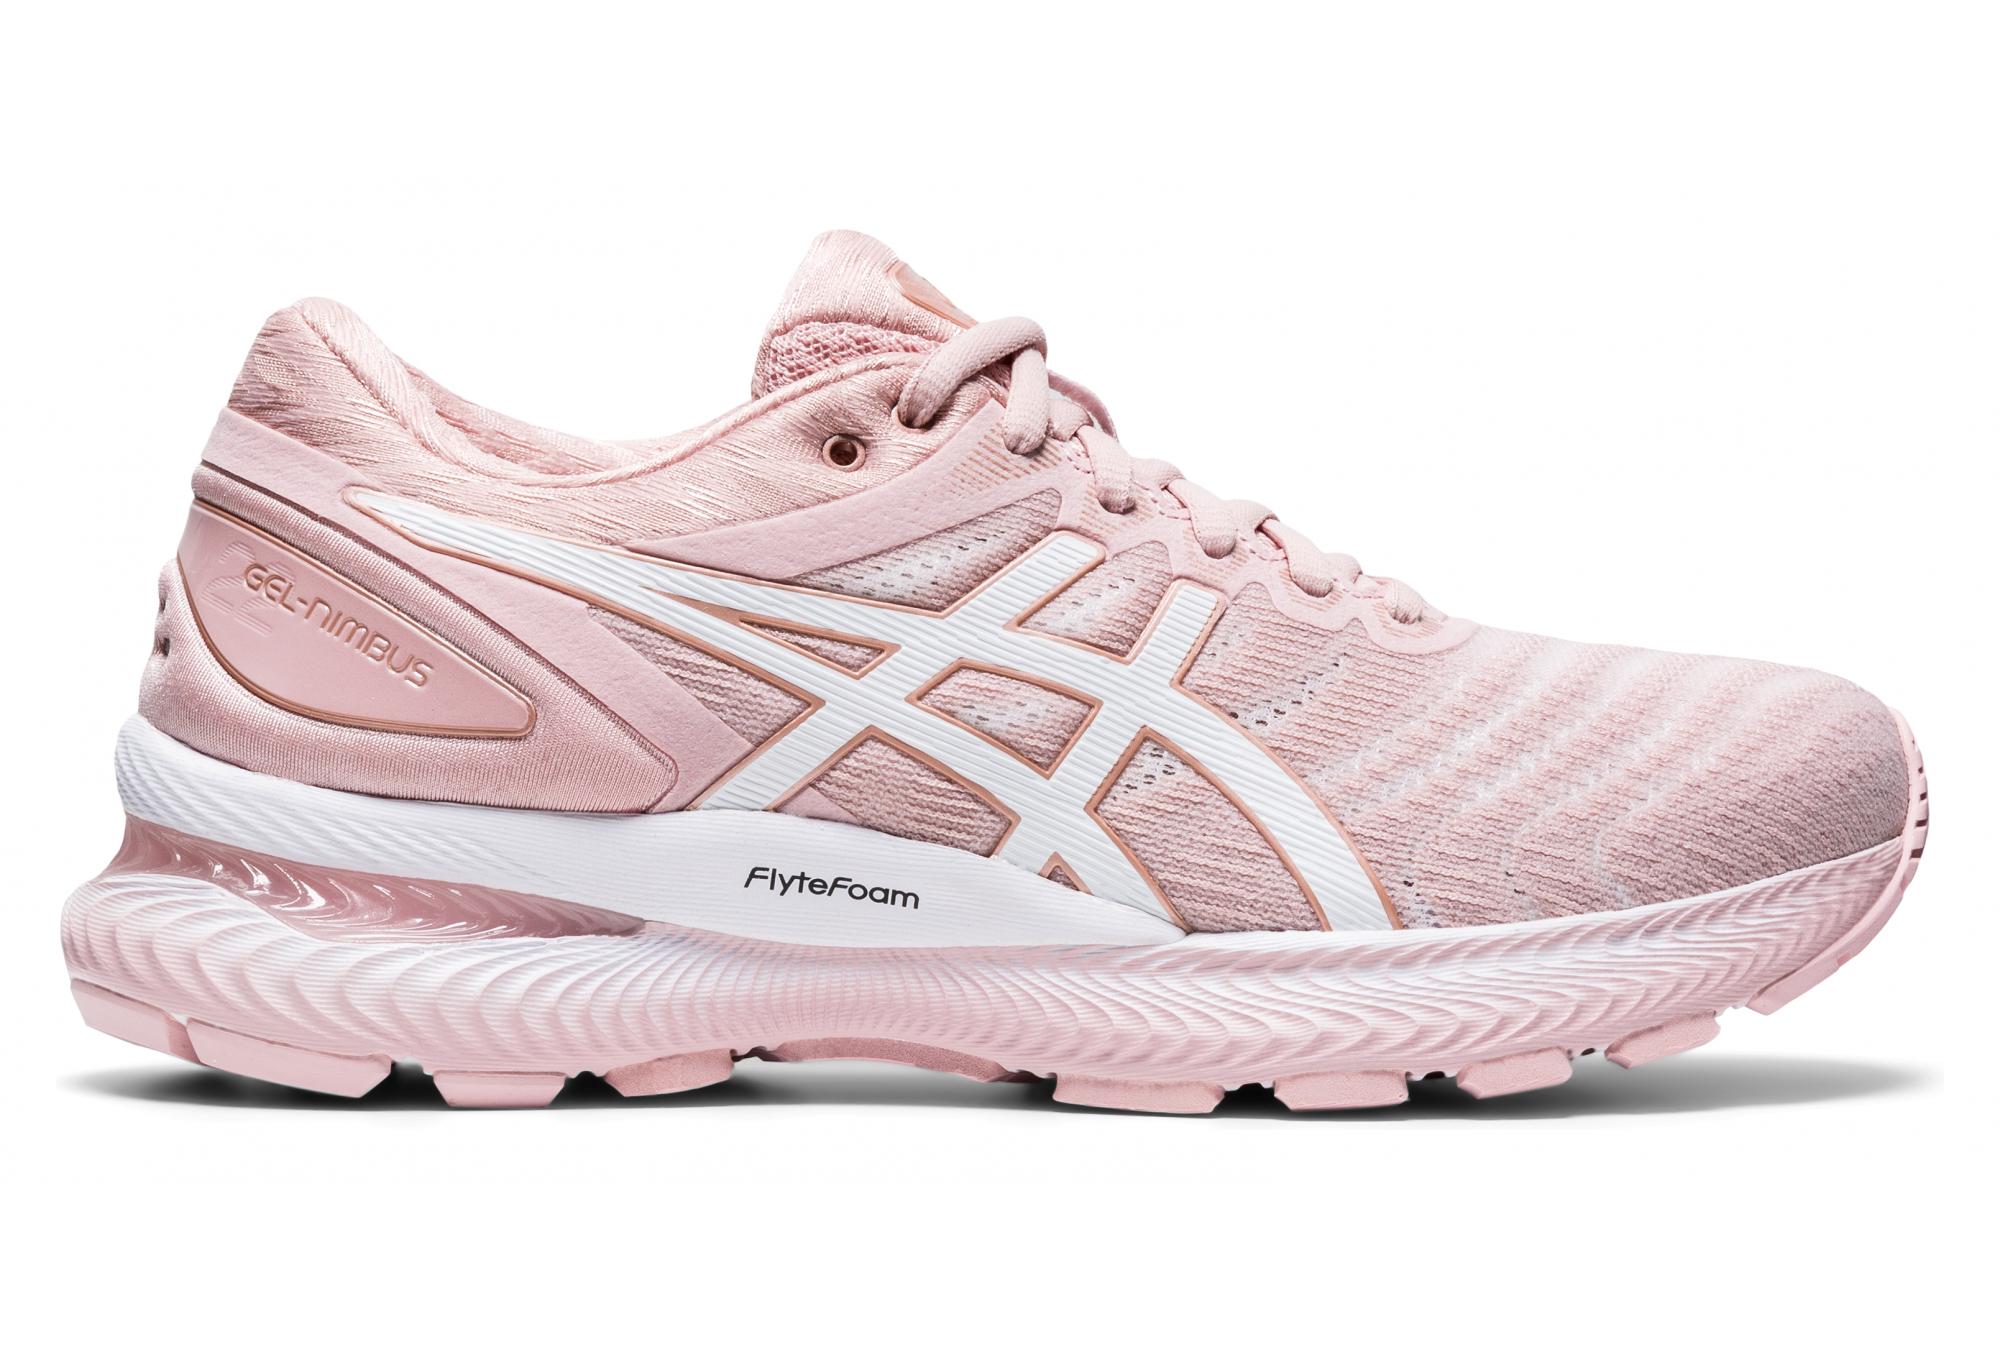 Chaussures de Running Femme Asics Gel Nimbus 22 Rose | Alltricks.fr